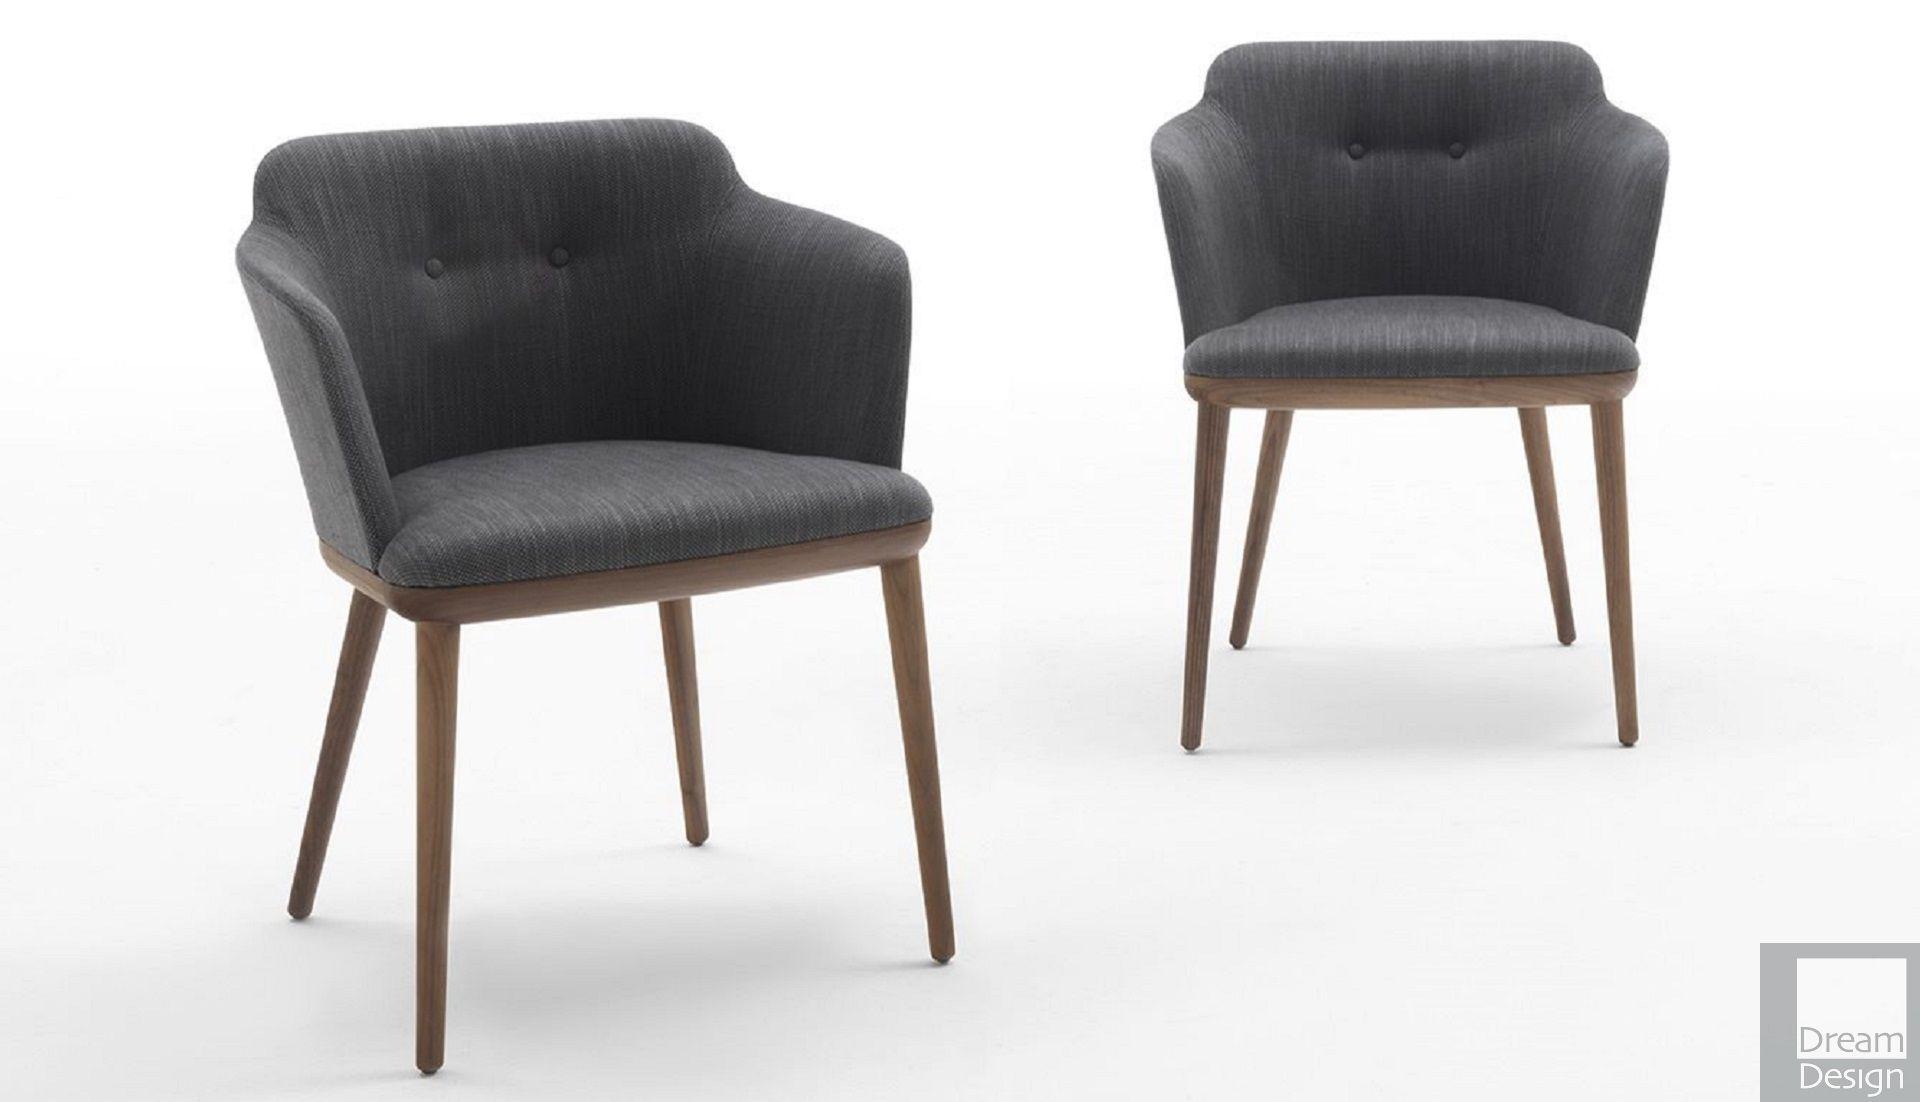 Porada Celine Chair Contemporary Dining Room Furniture Dining